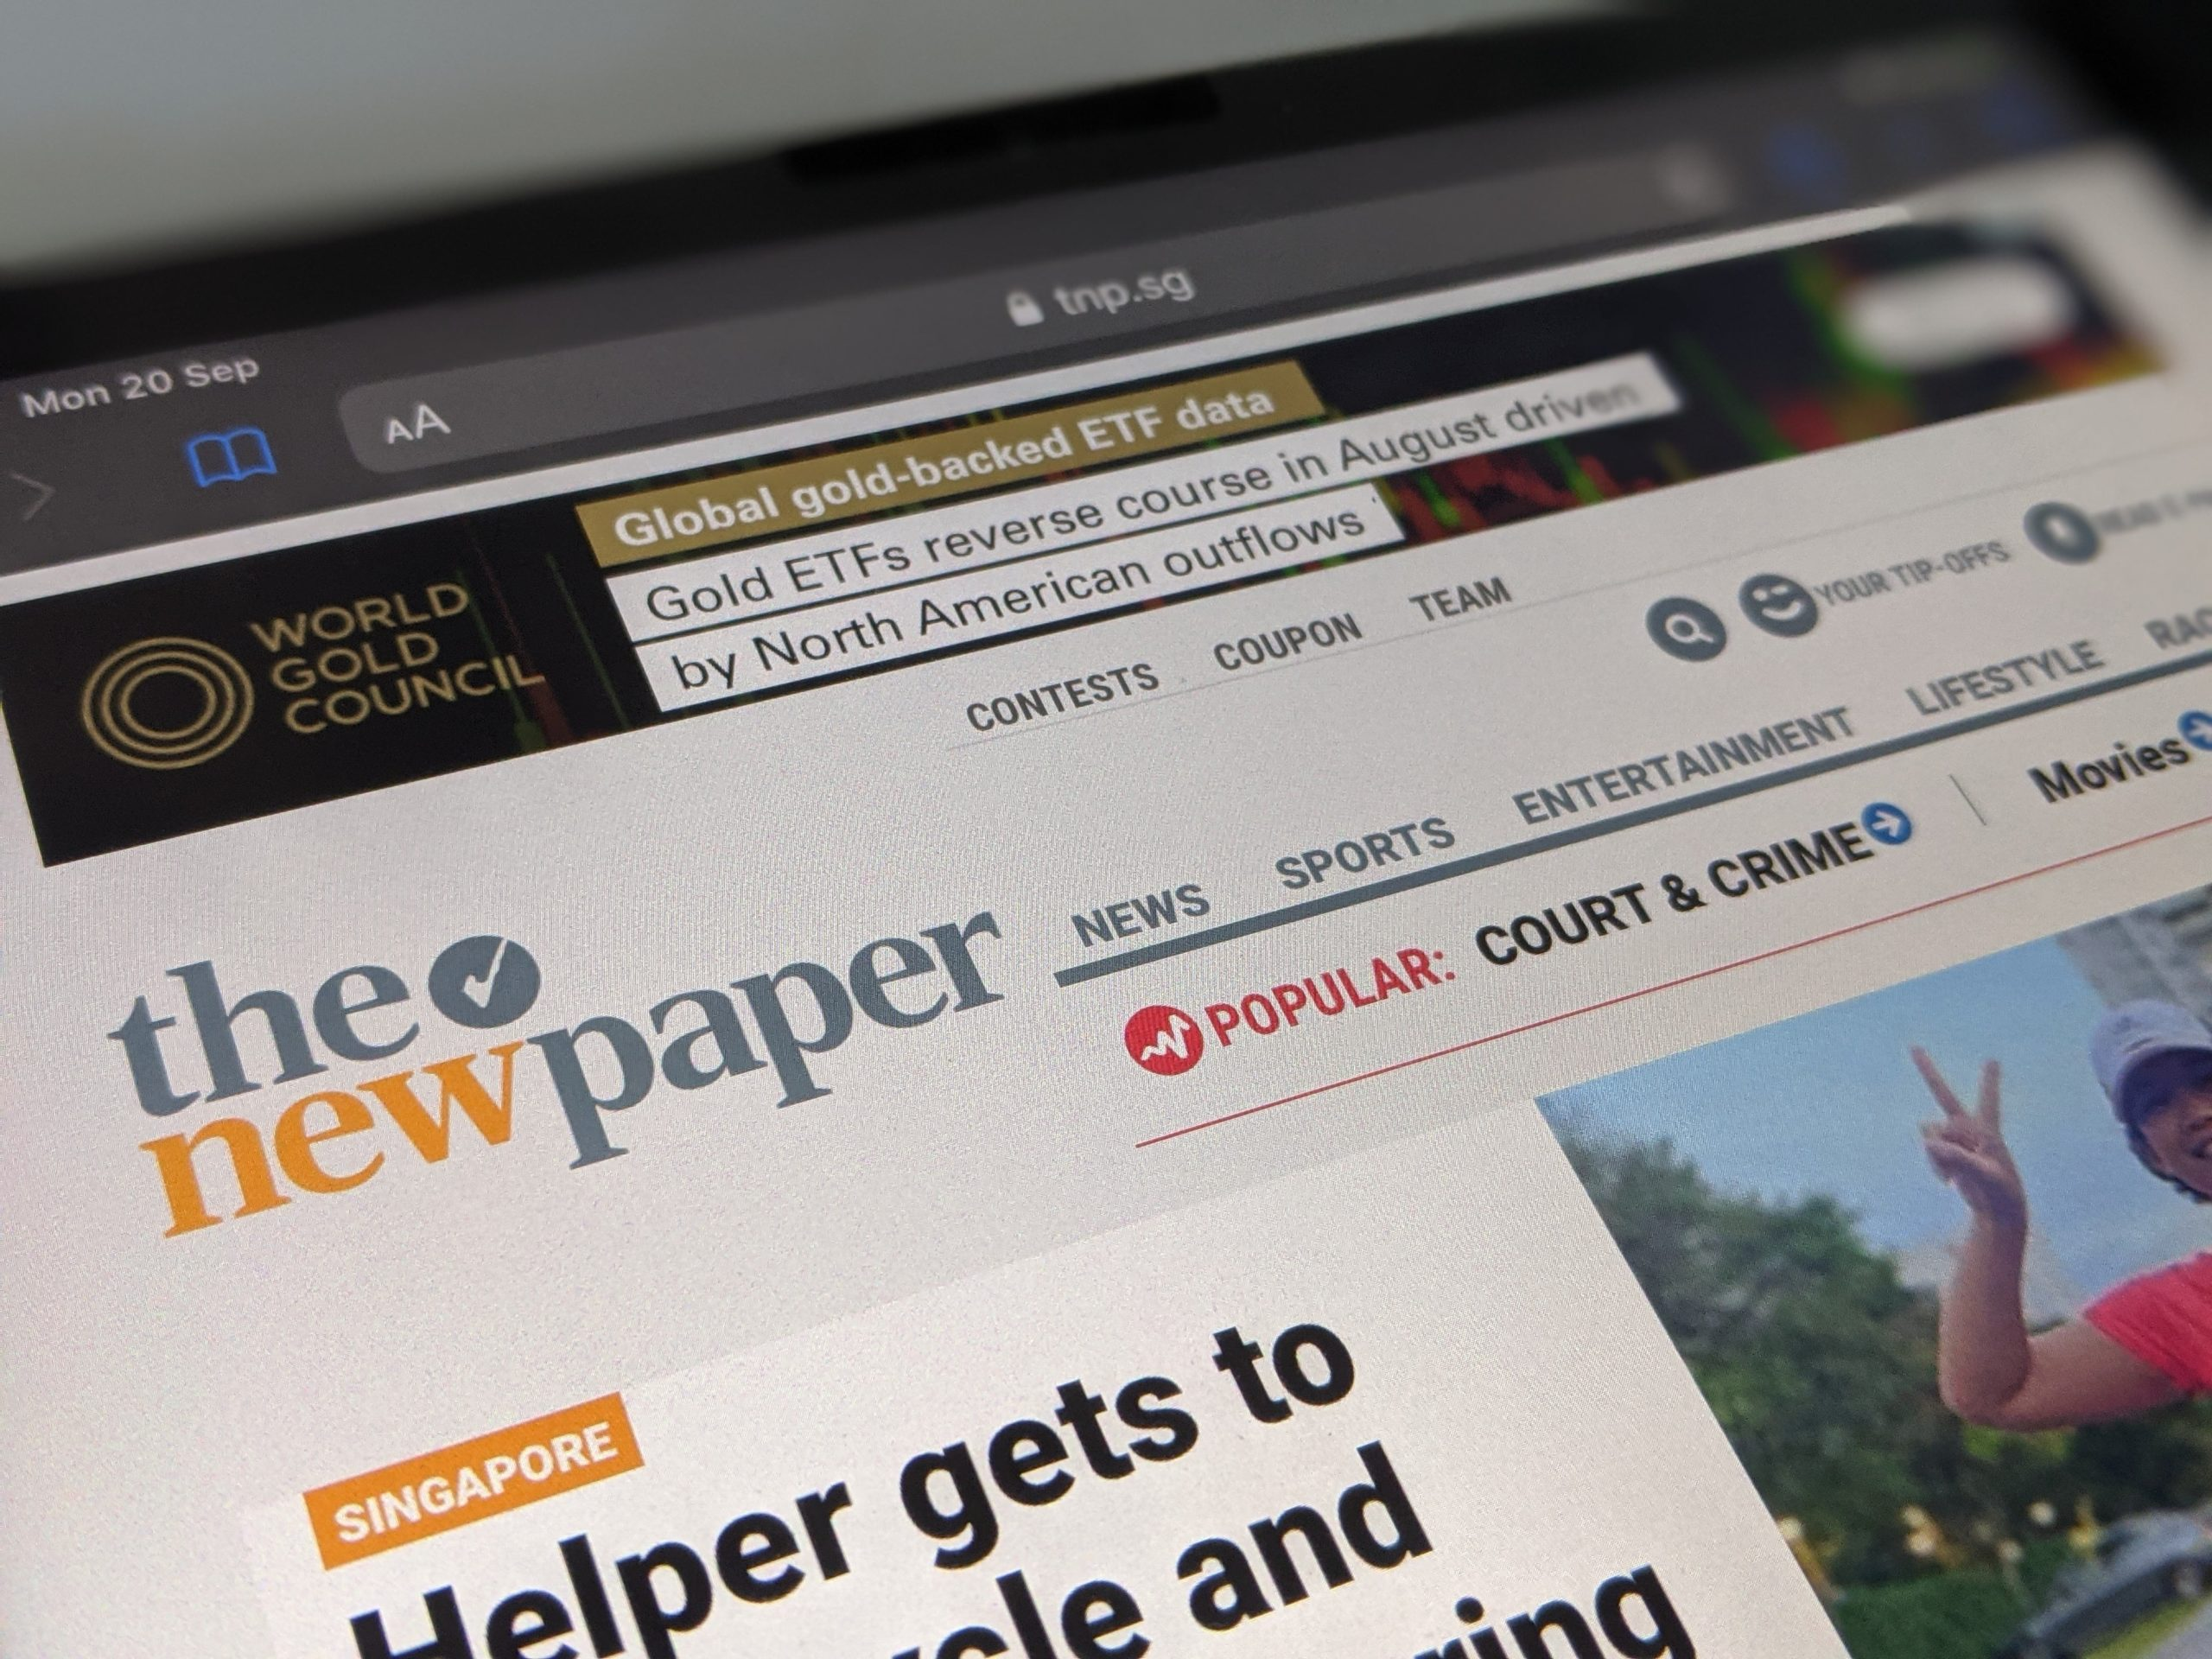 The New Paper digital